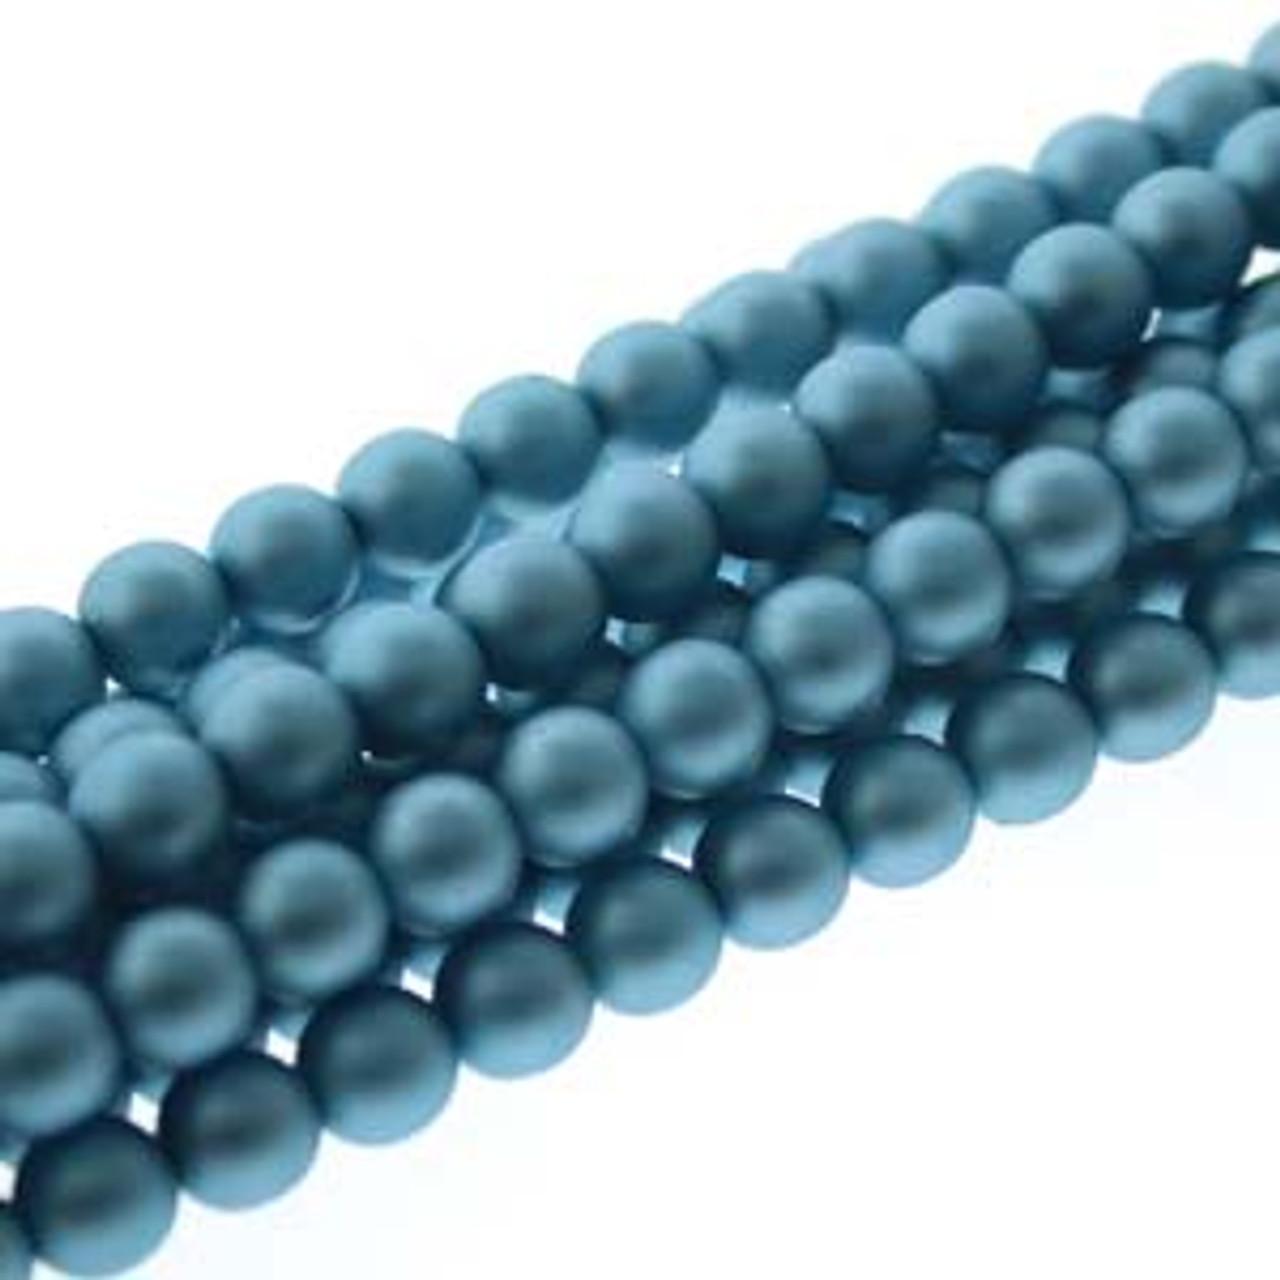 6mm Matte Cerulean Glass Pearls - 75 Beads